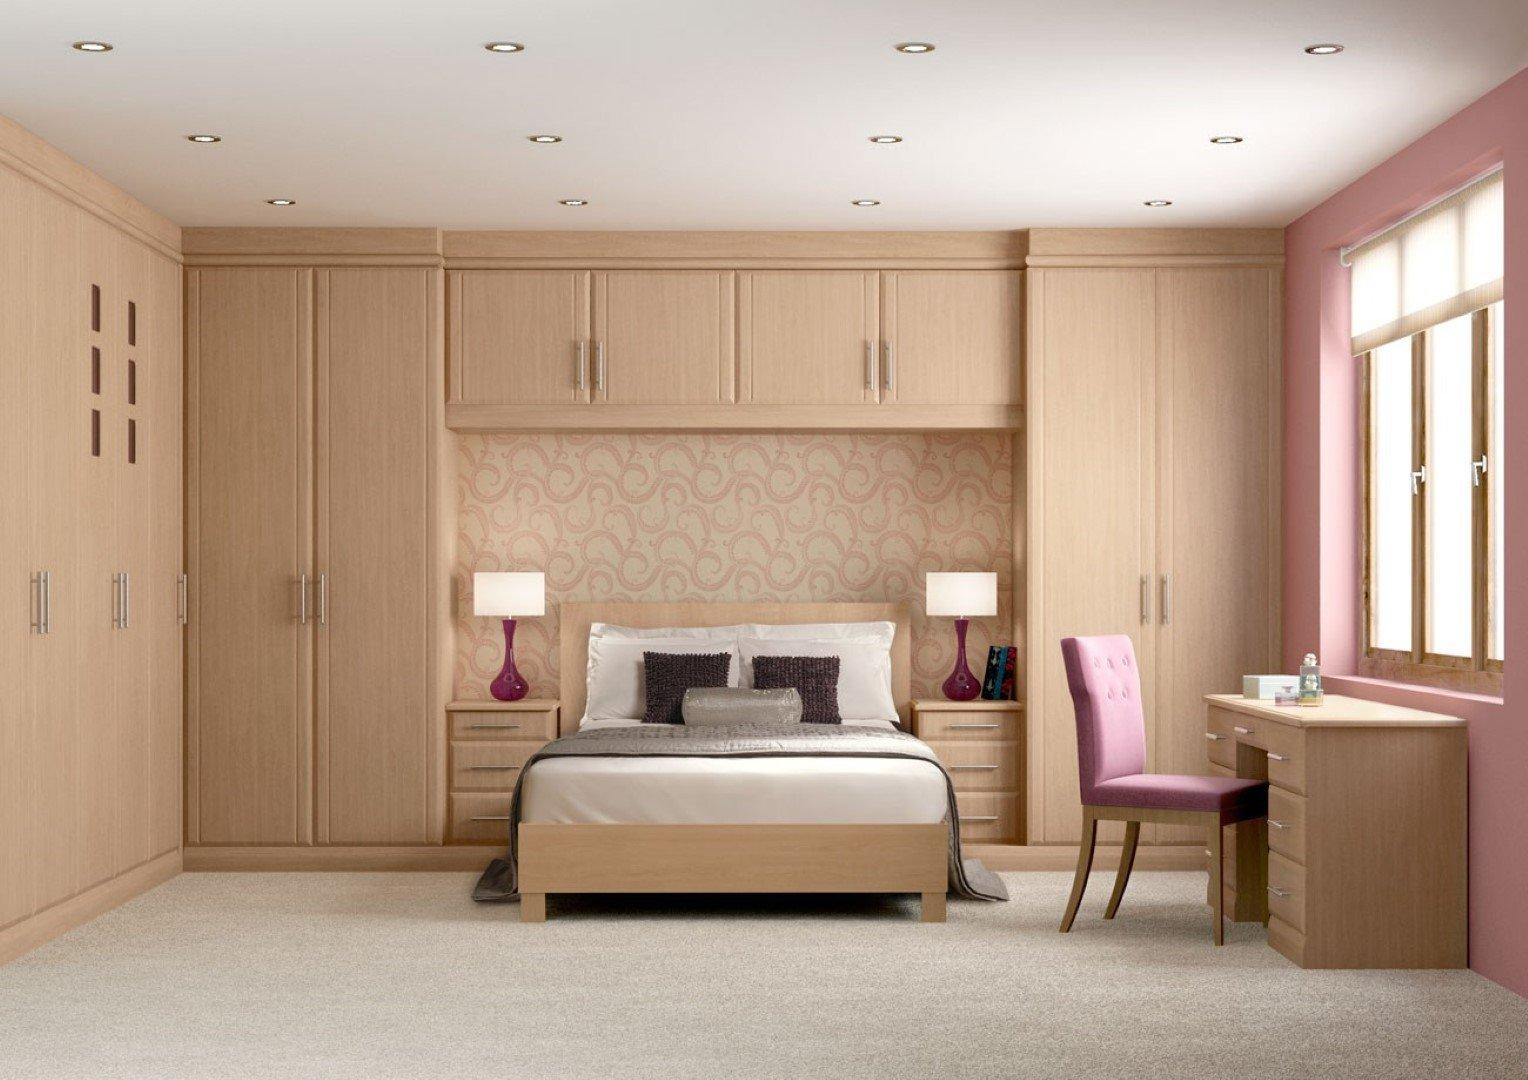 Sneak peek large: 1000 ideas about fitted bedroom wardrobes .